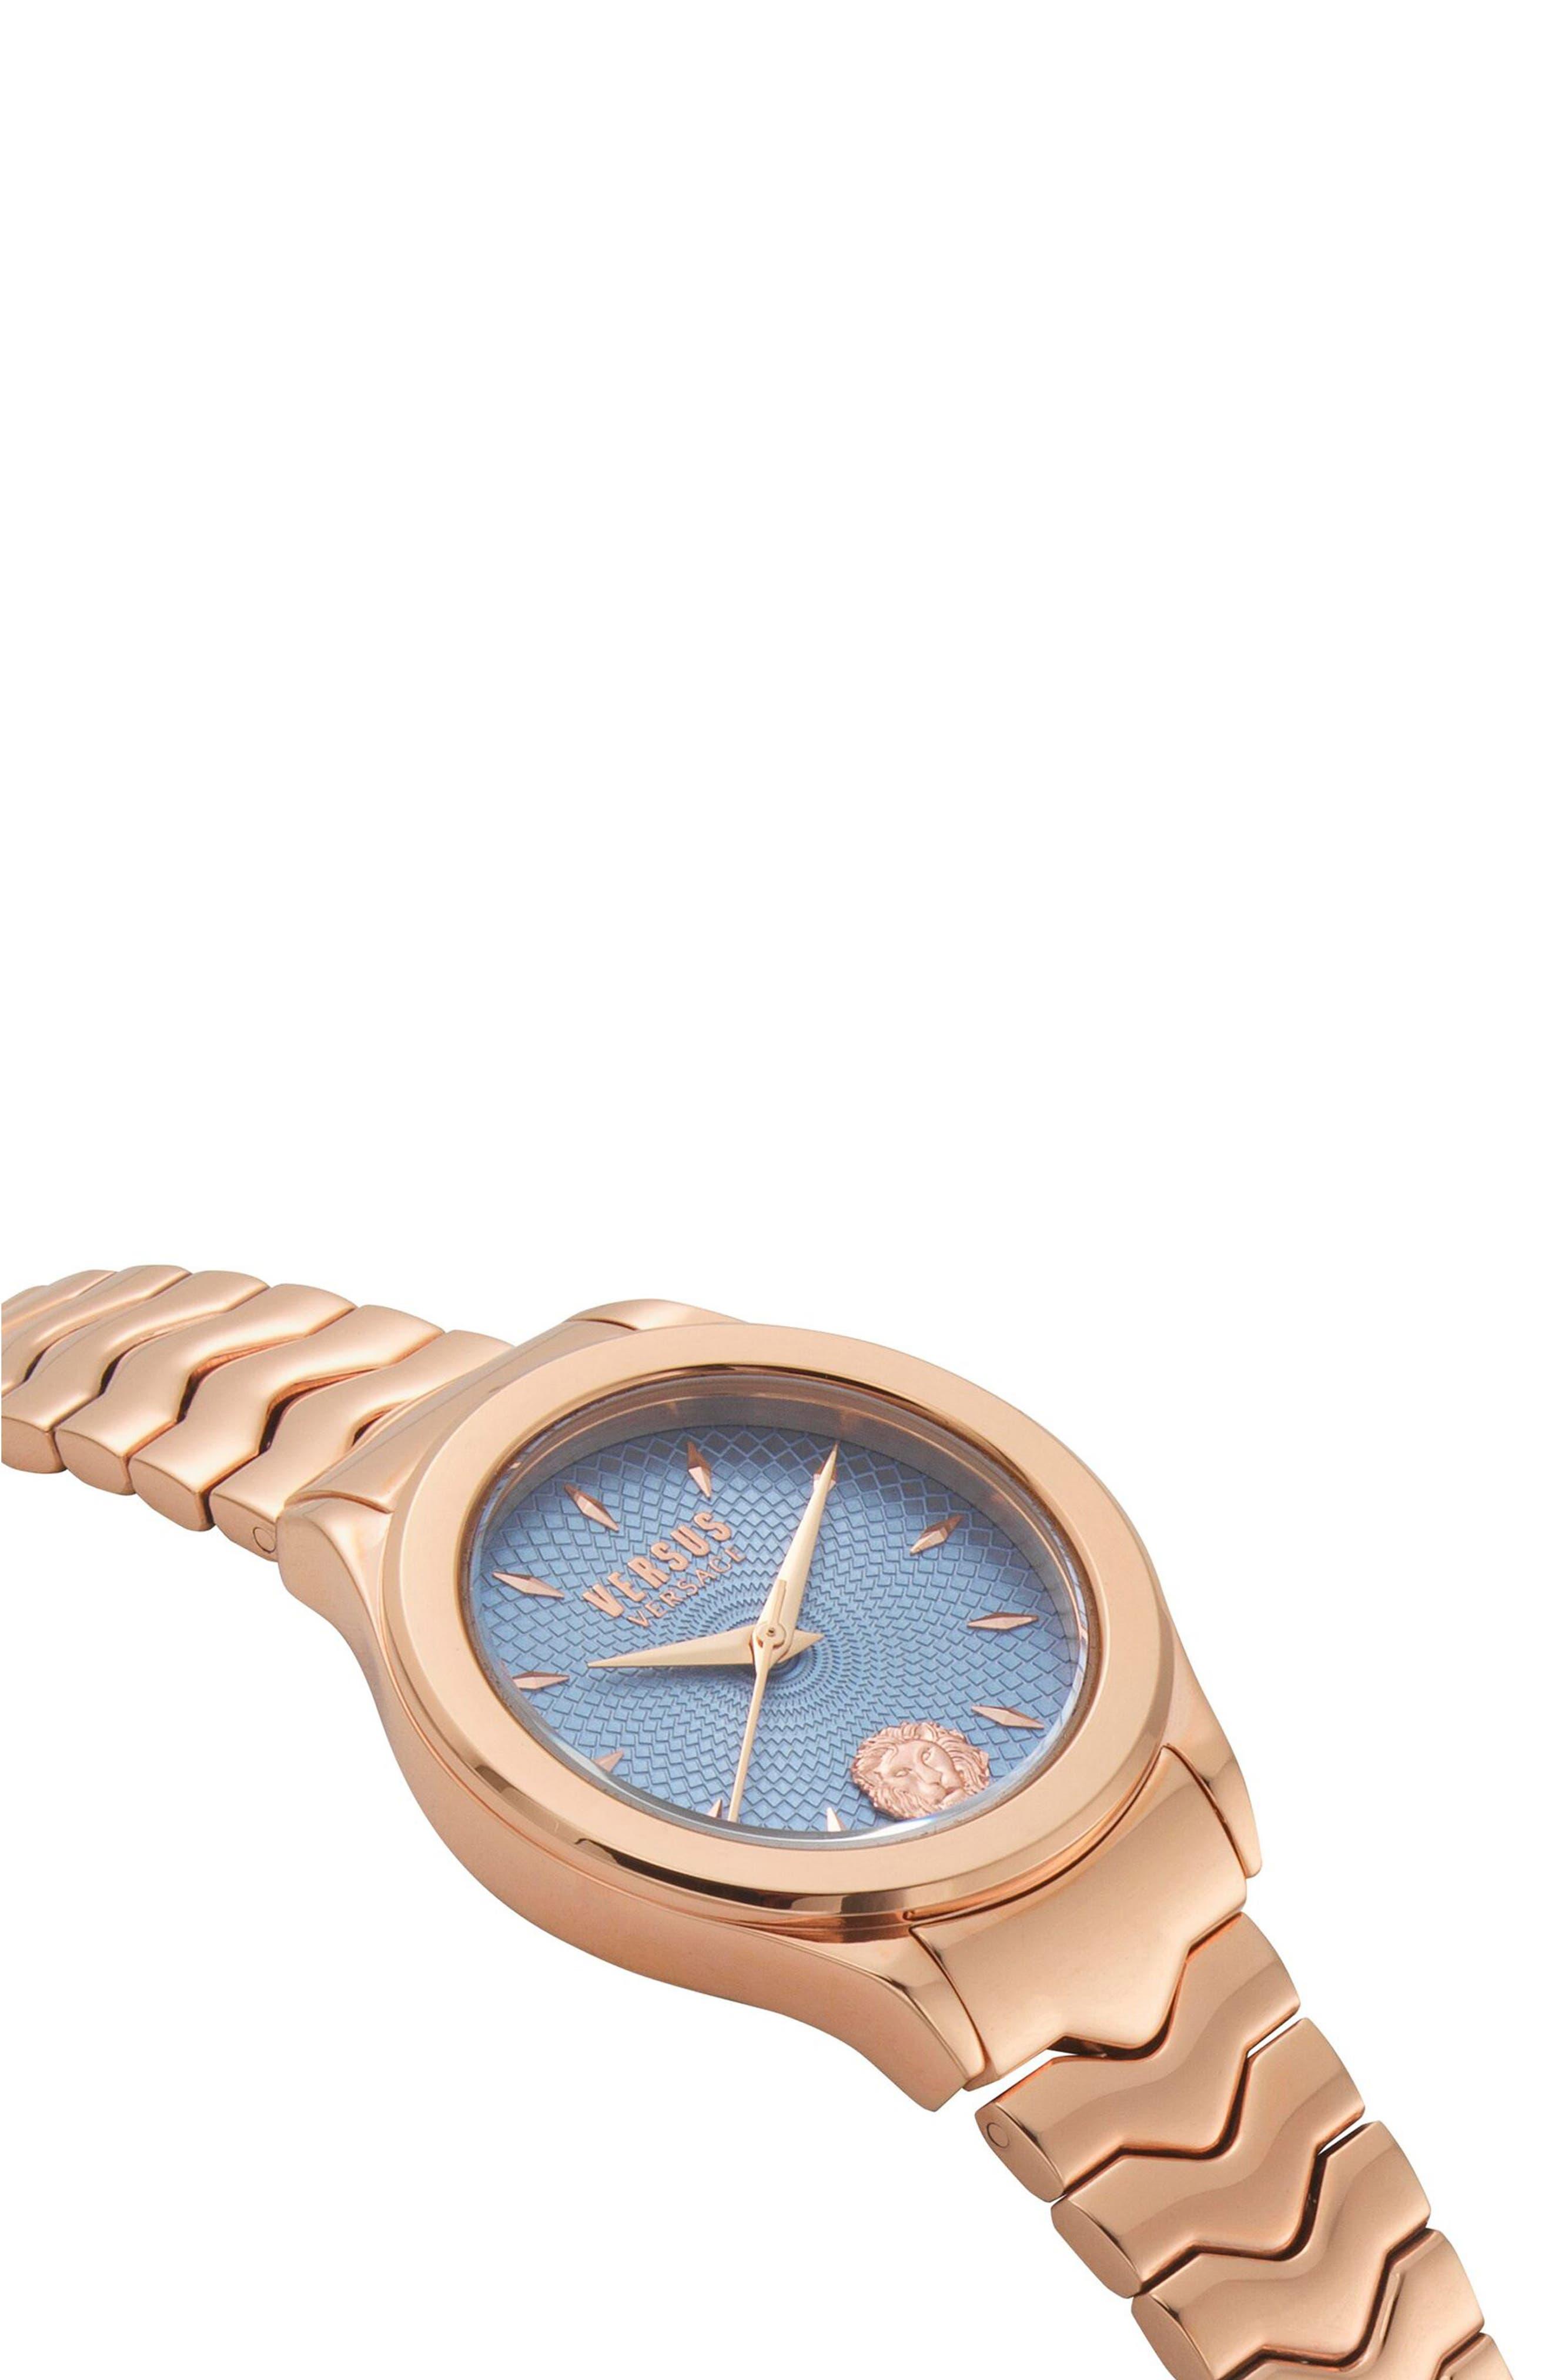 VERSUS VERSACE, Mount Pleasant Bracelet Watch, 34mm, Alternate thumbnail 3, color, ROSE GOLD/ BLUE/ ROSE GOLD